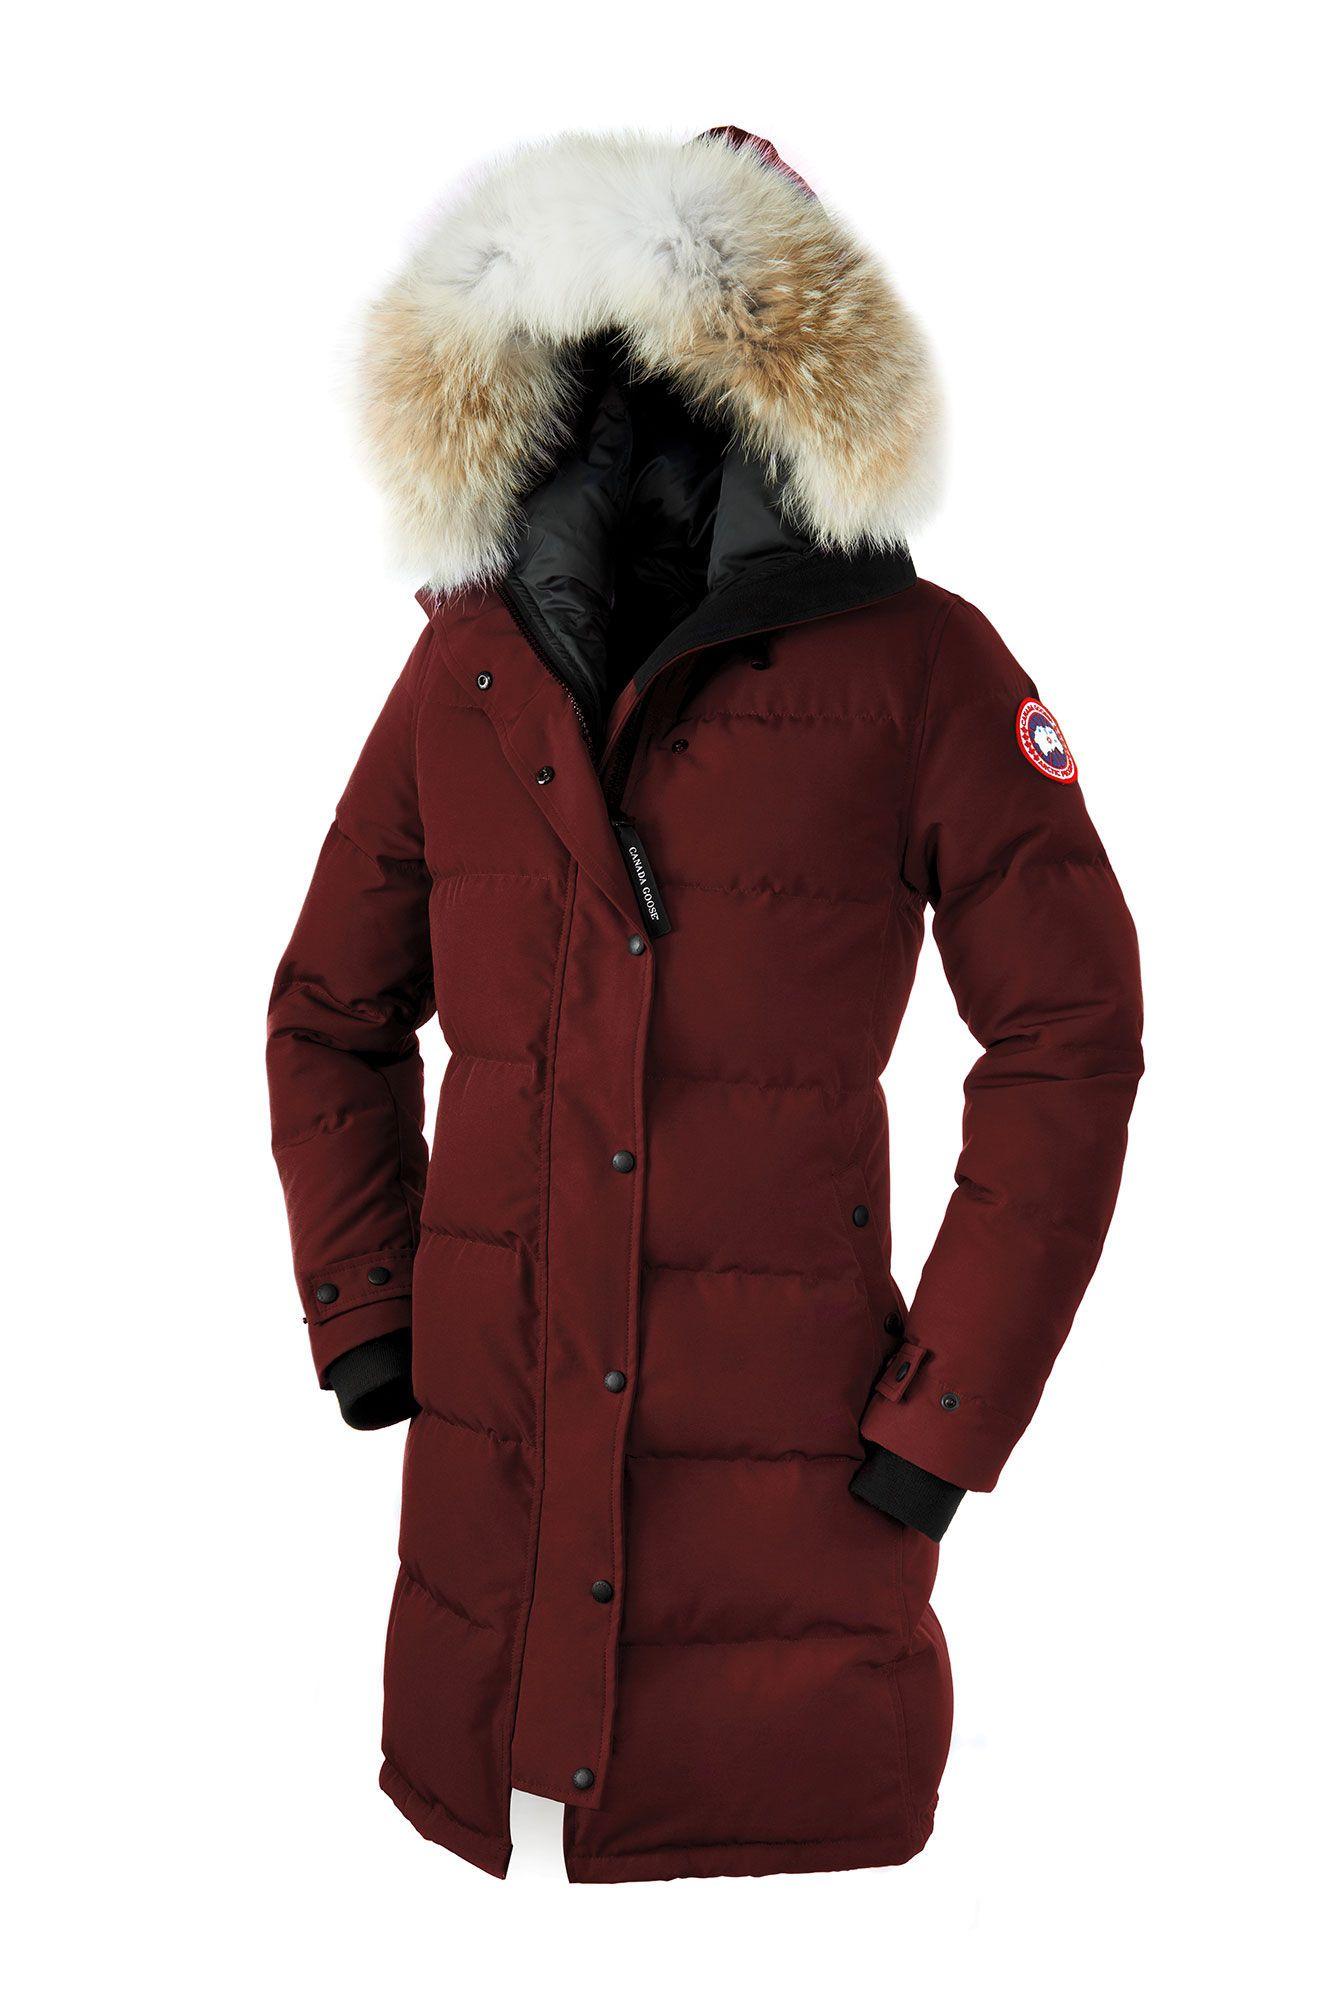 Canada Goose Accesorios Especial